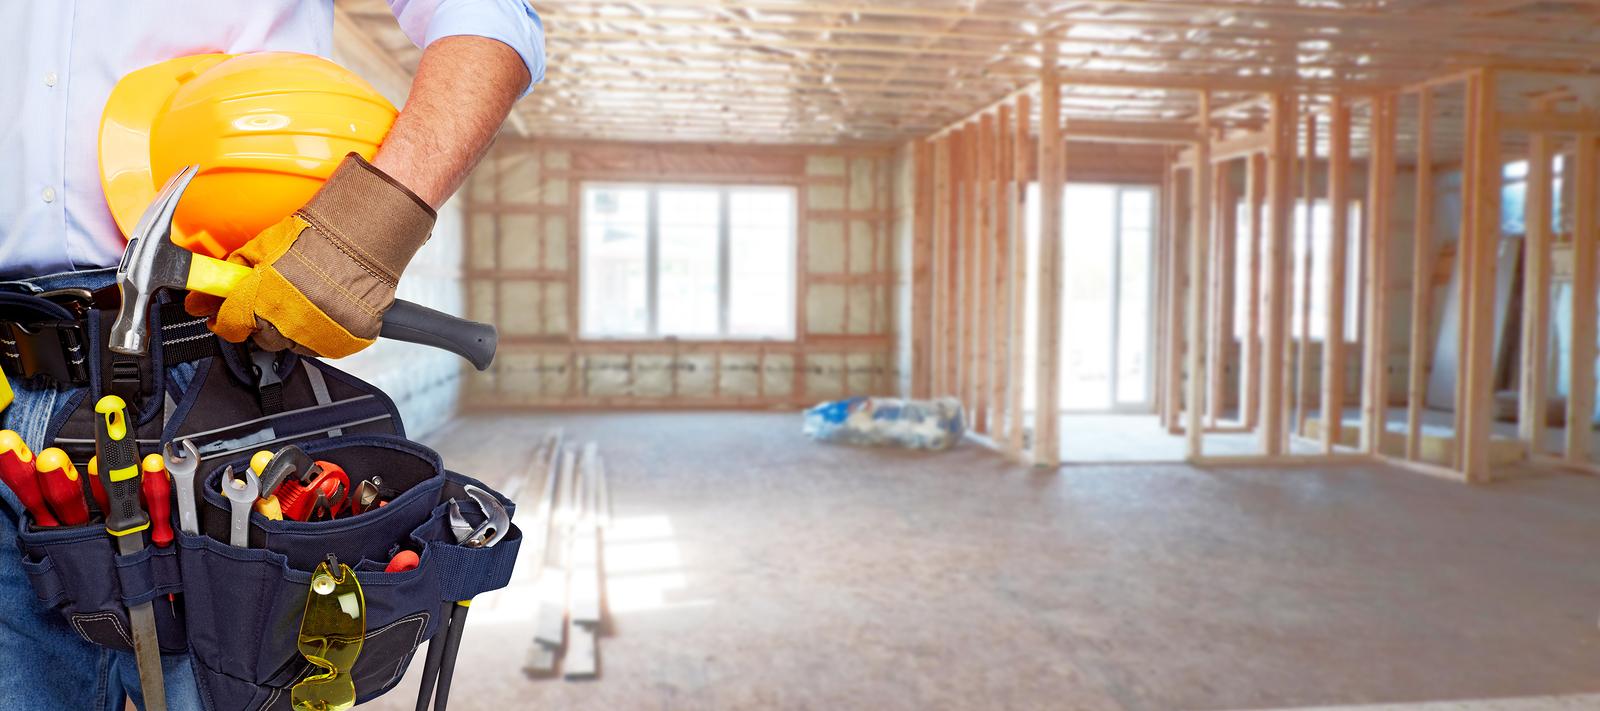 bigstock-Builder-handyman-with-construc-101147528